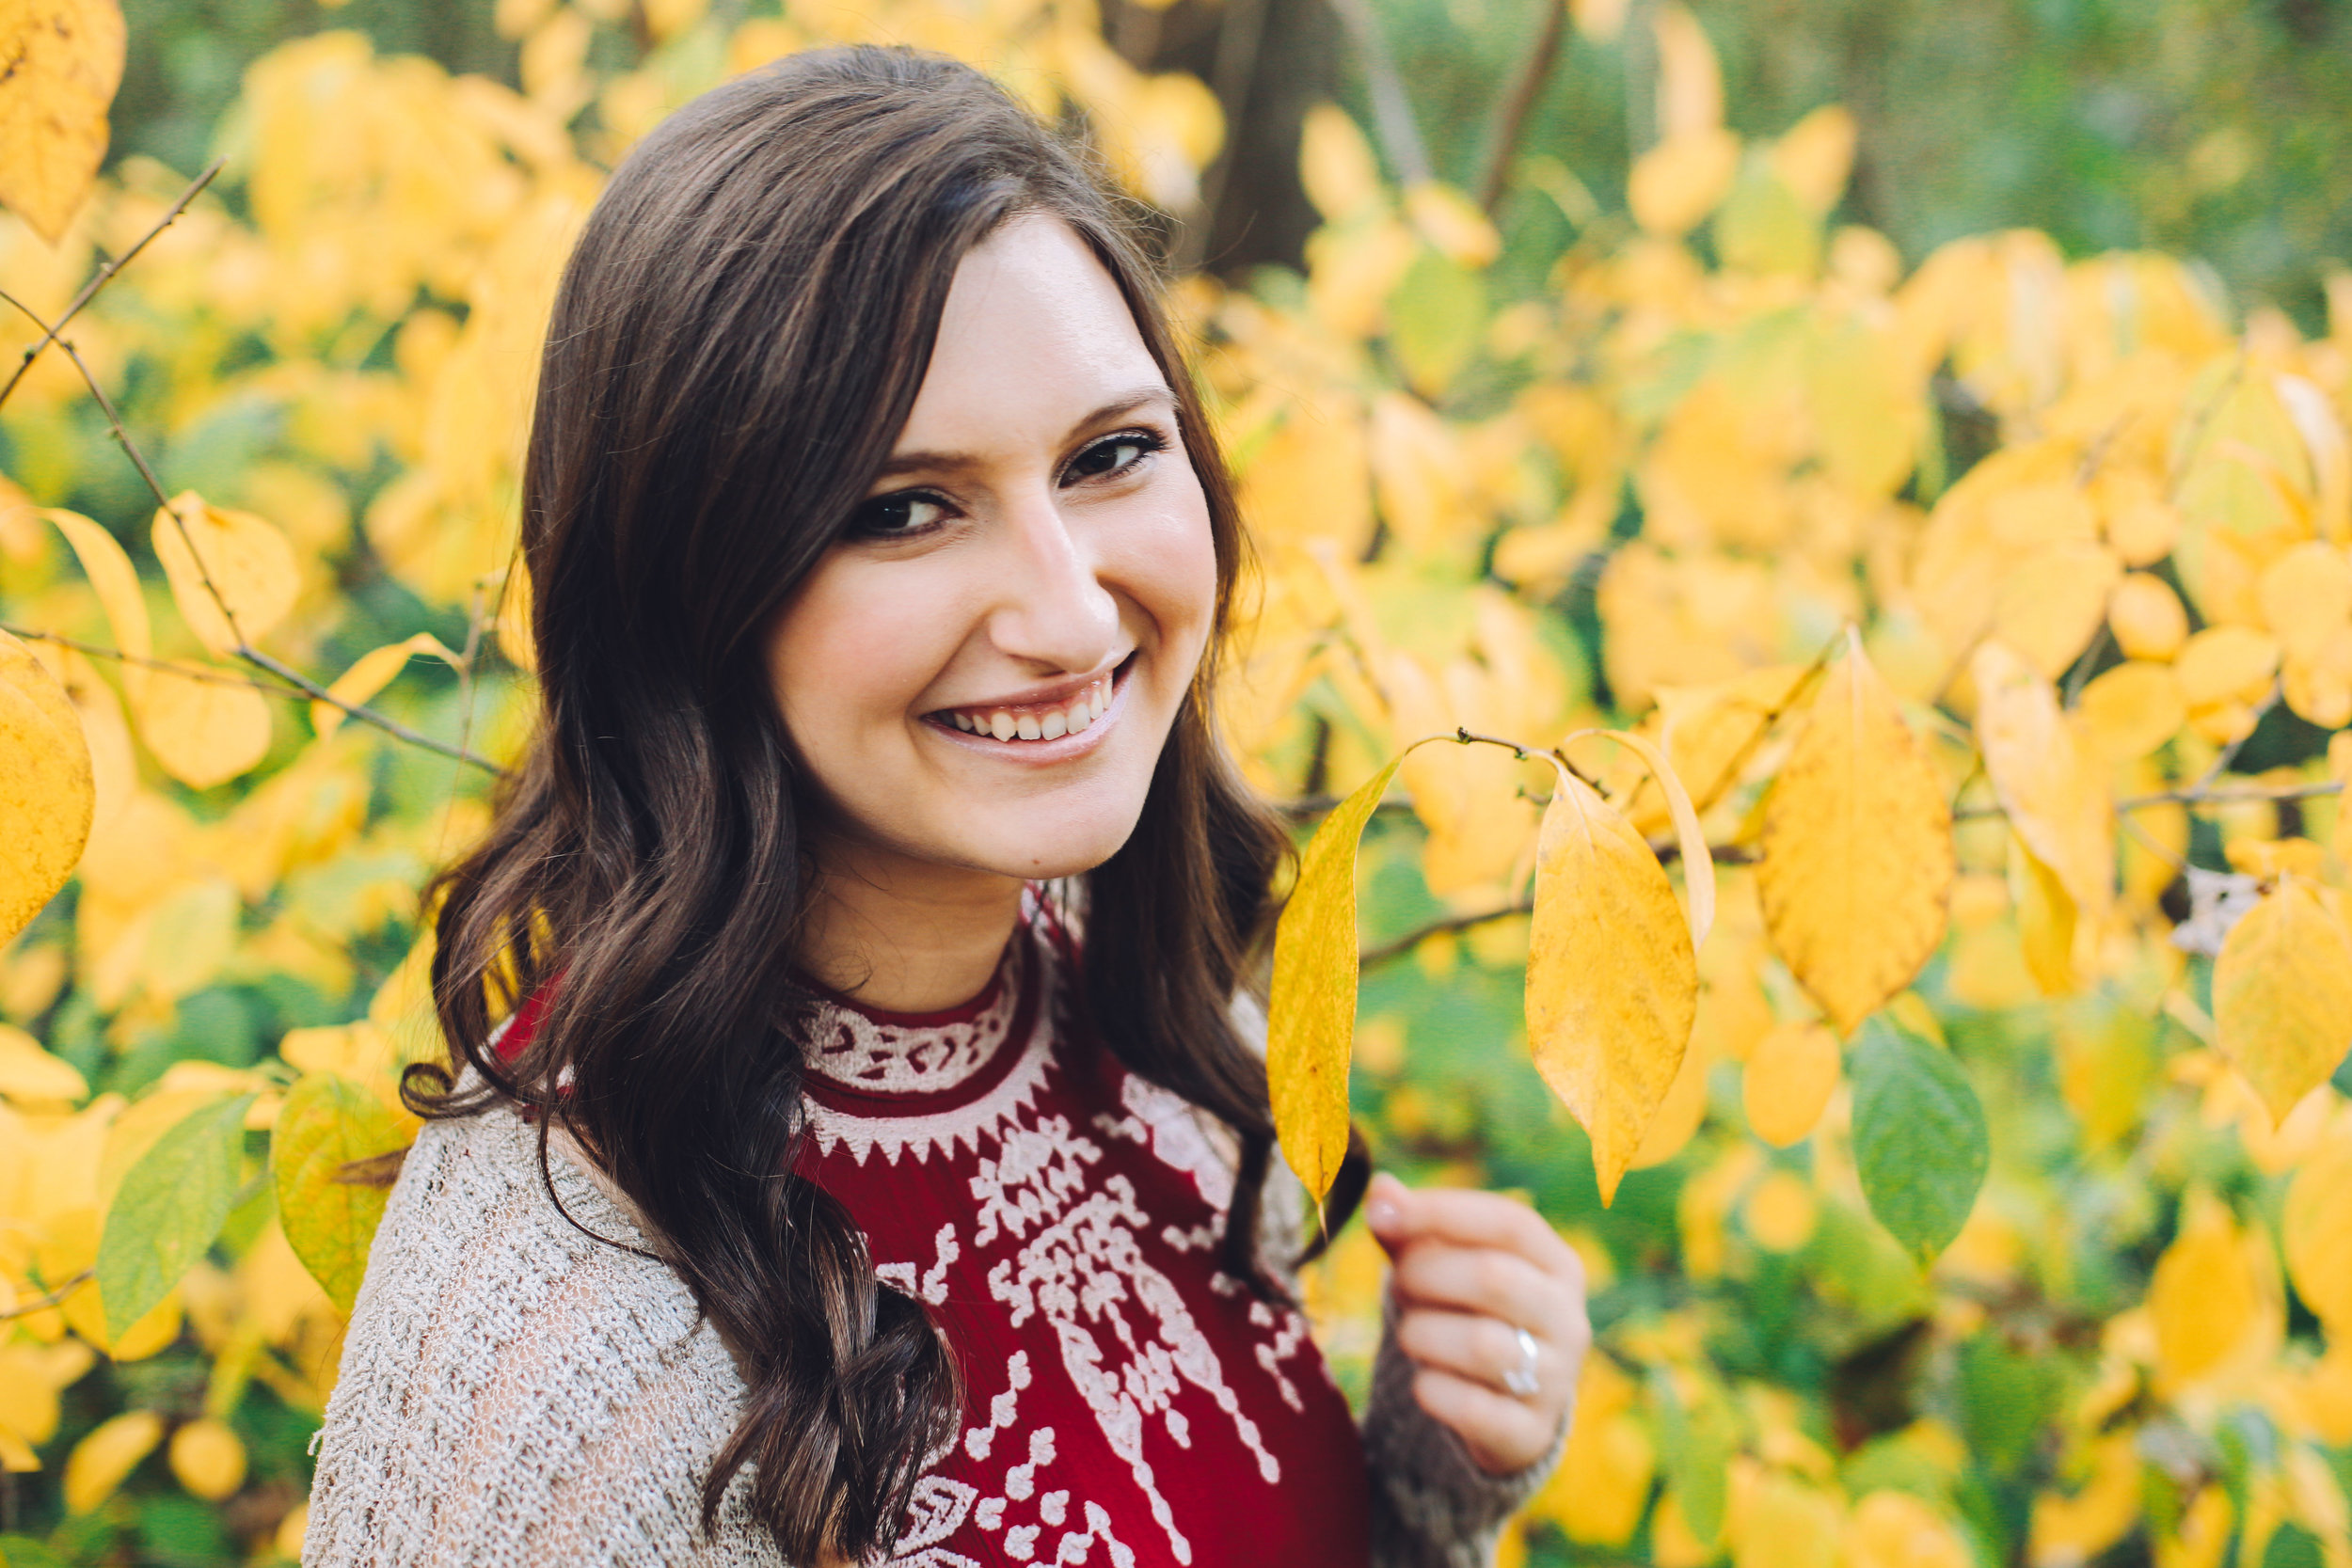 Katherine Bathe Senior Photo Session Indianapolis IN (24 of 71).jpg